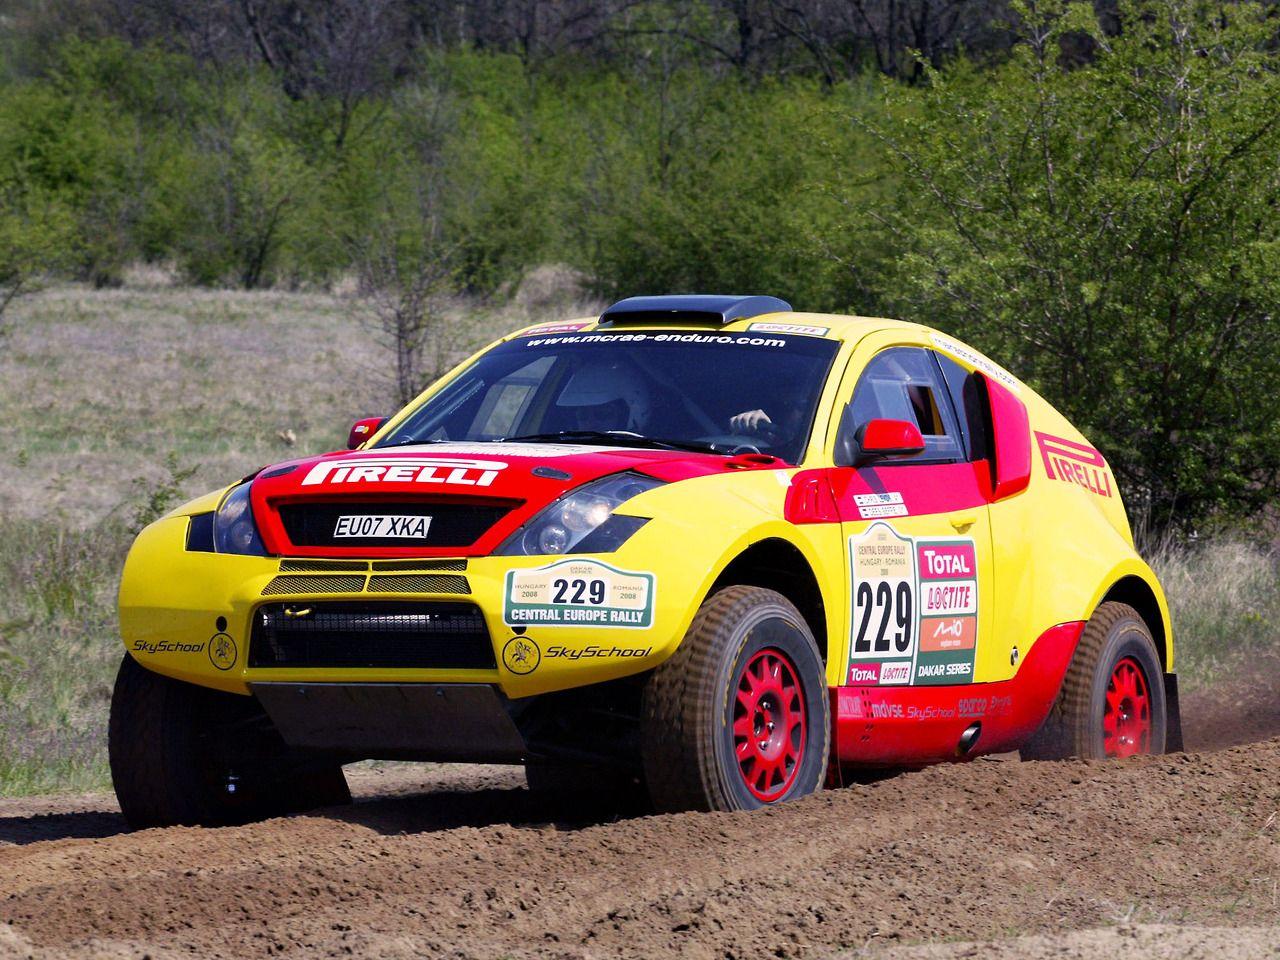 McRae Enduro rally raid car   Cars   Pinterest   Rally, Cars and ...